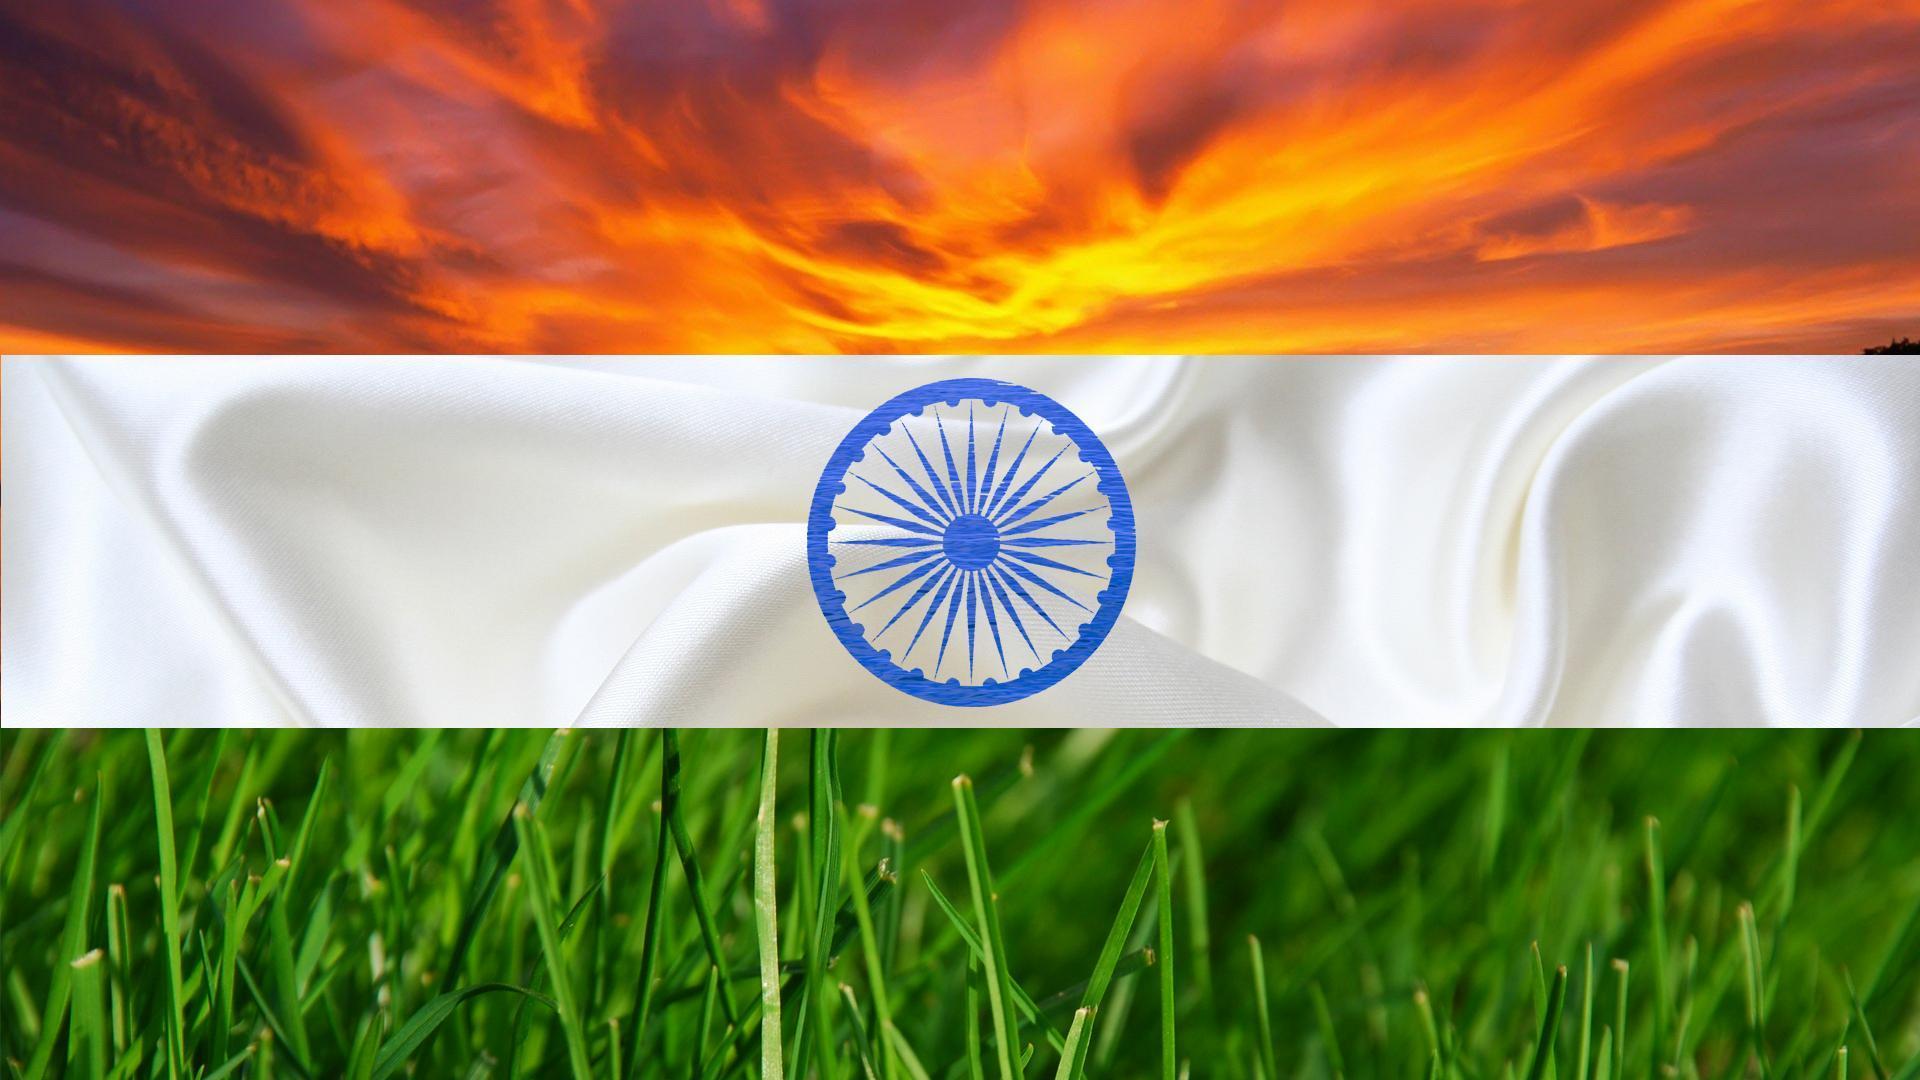 Wallpaperwiki Indian Flag Desktop Wallpaper PIC WPD005455